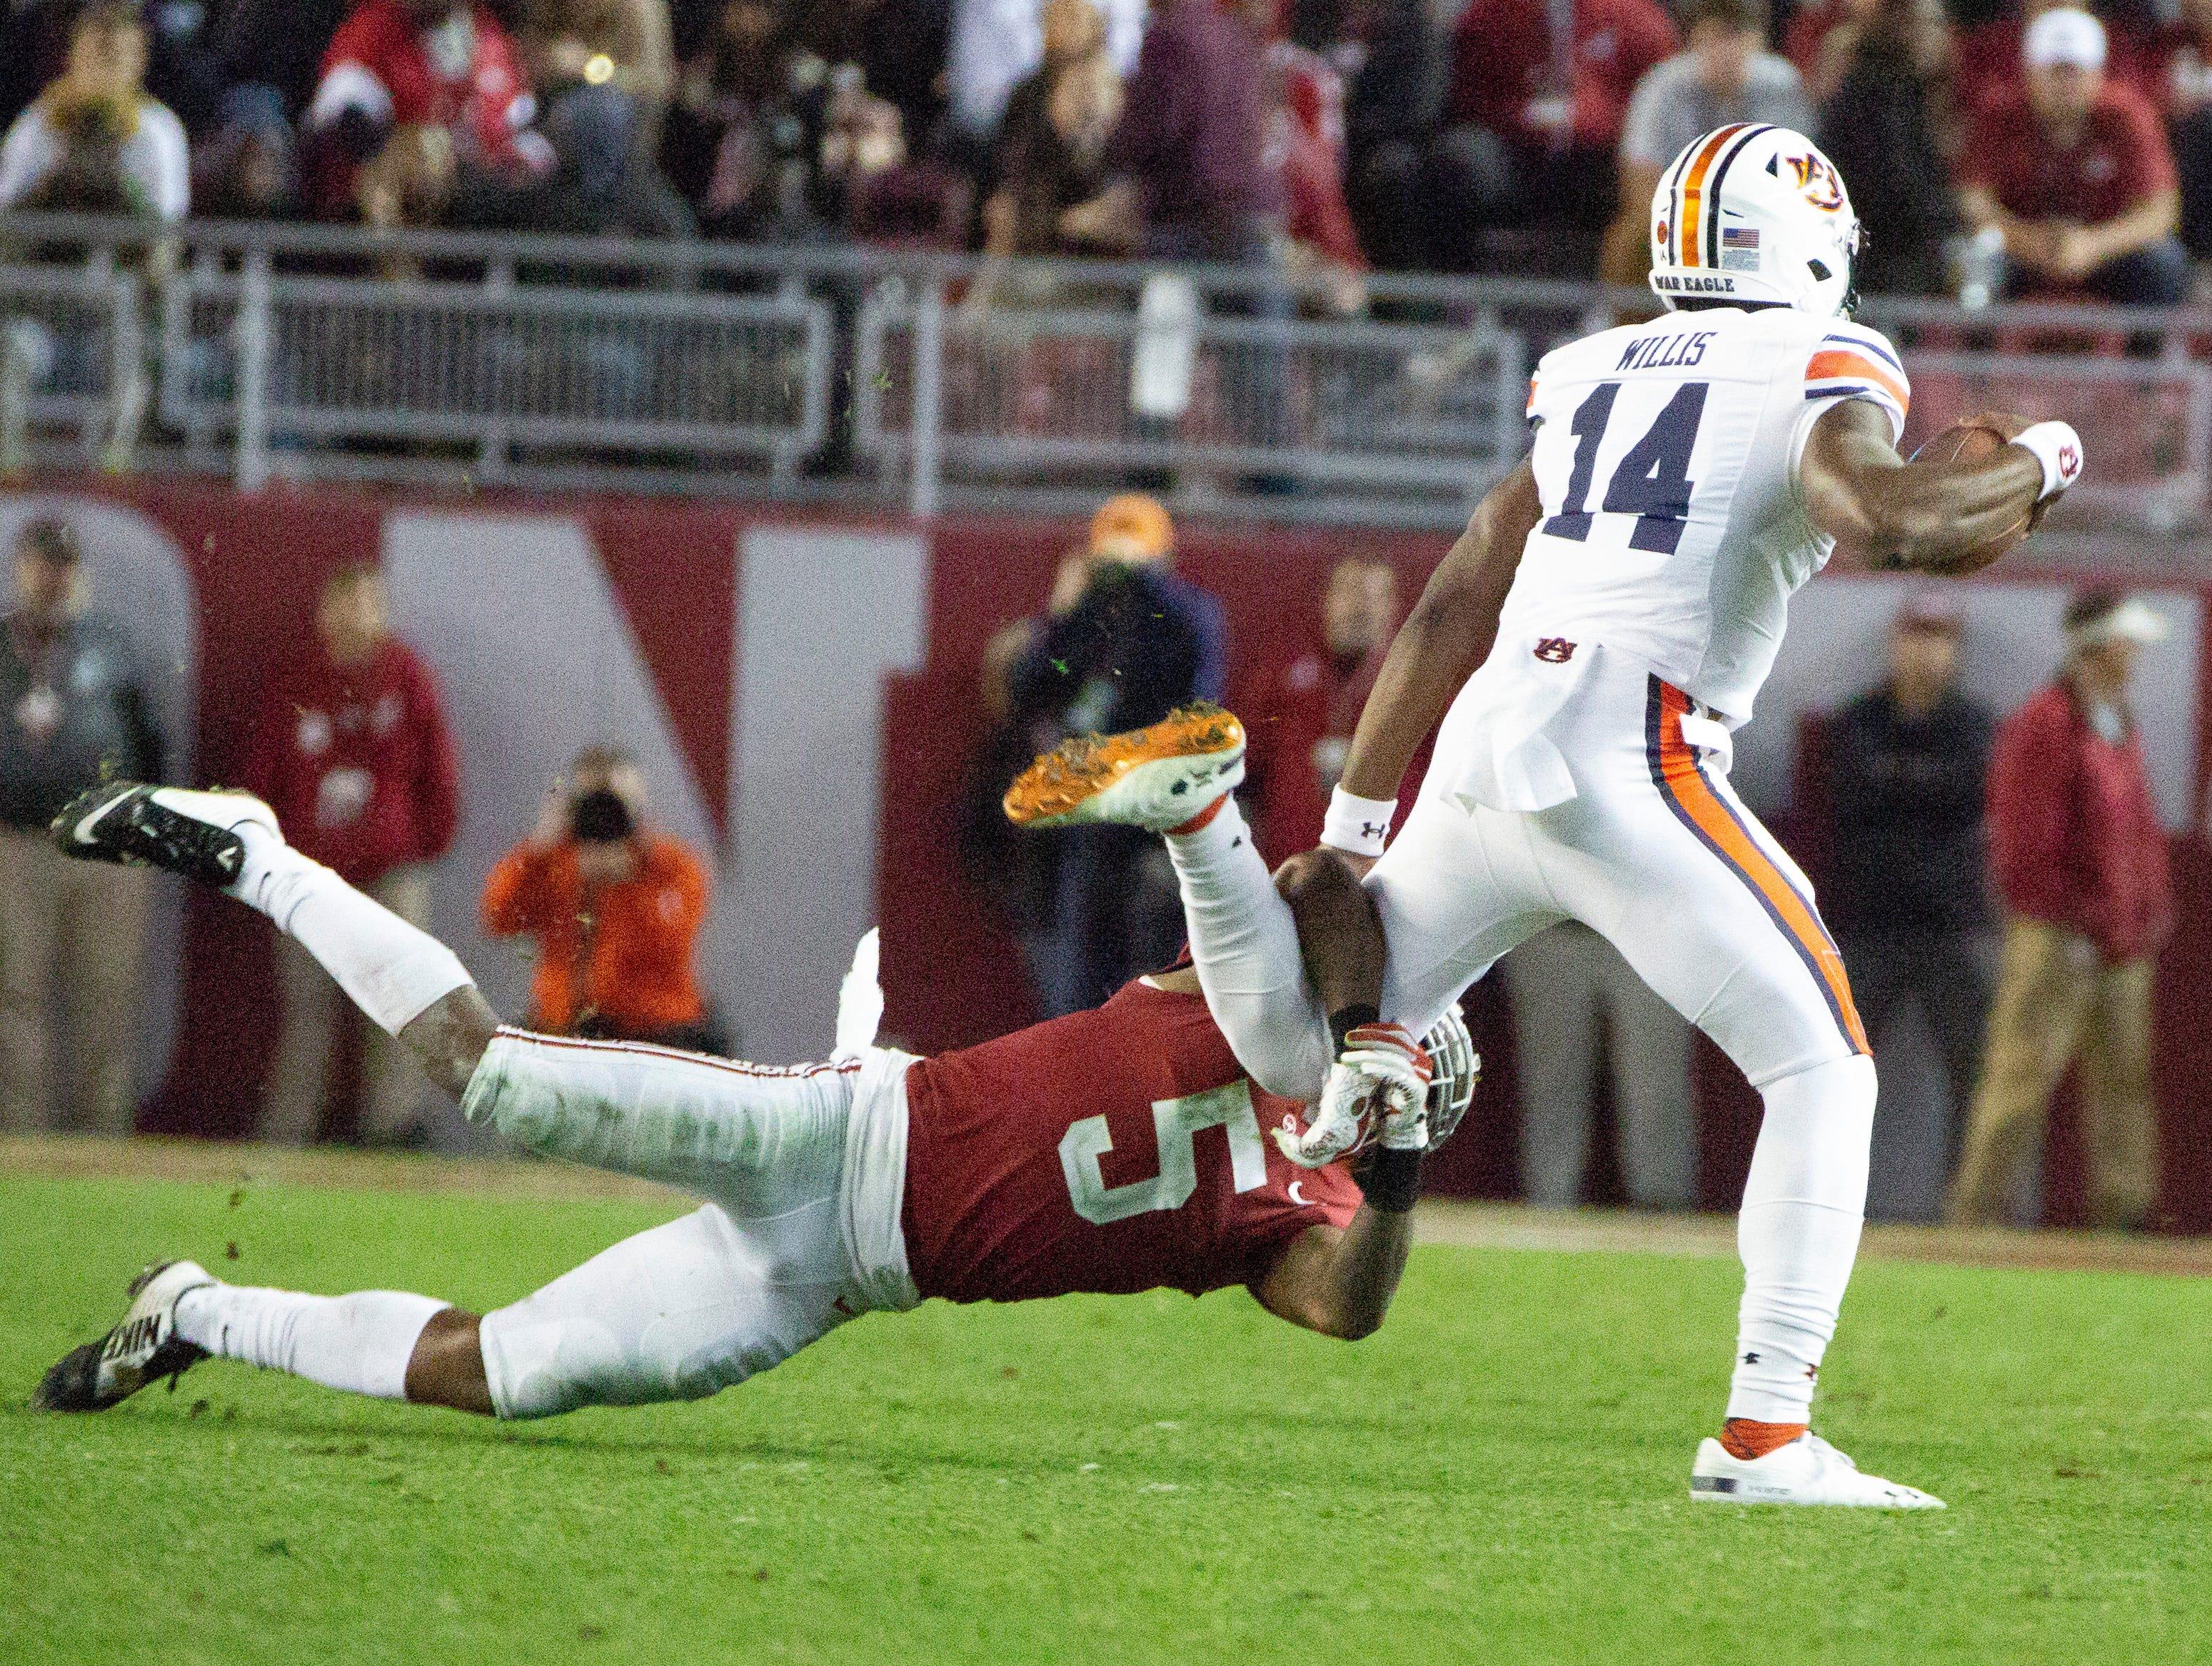 Alabama's Shyheim Carter grabs ahold of Auburn's Malik Willis' leg for a tackle in the fourth quarter.